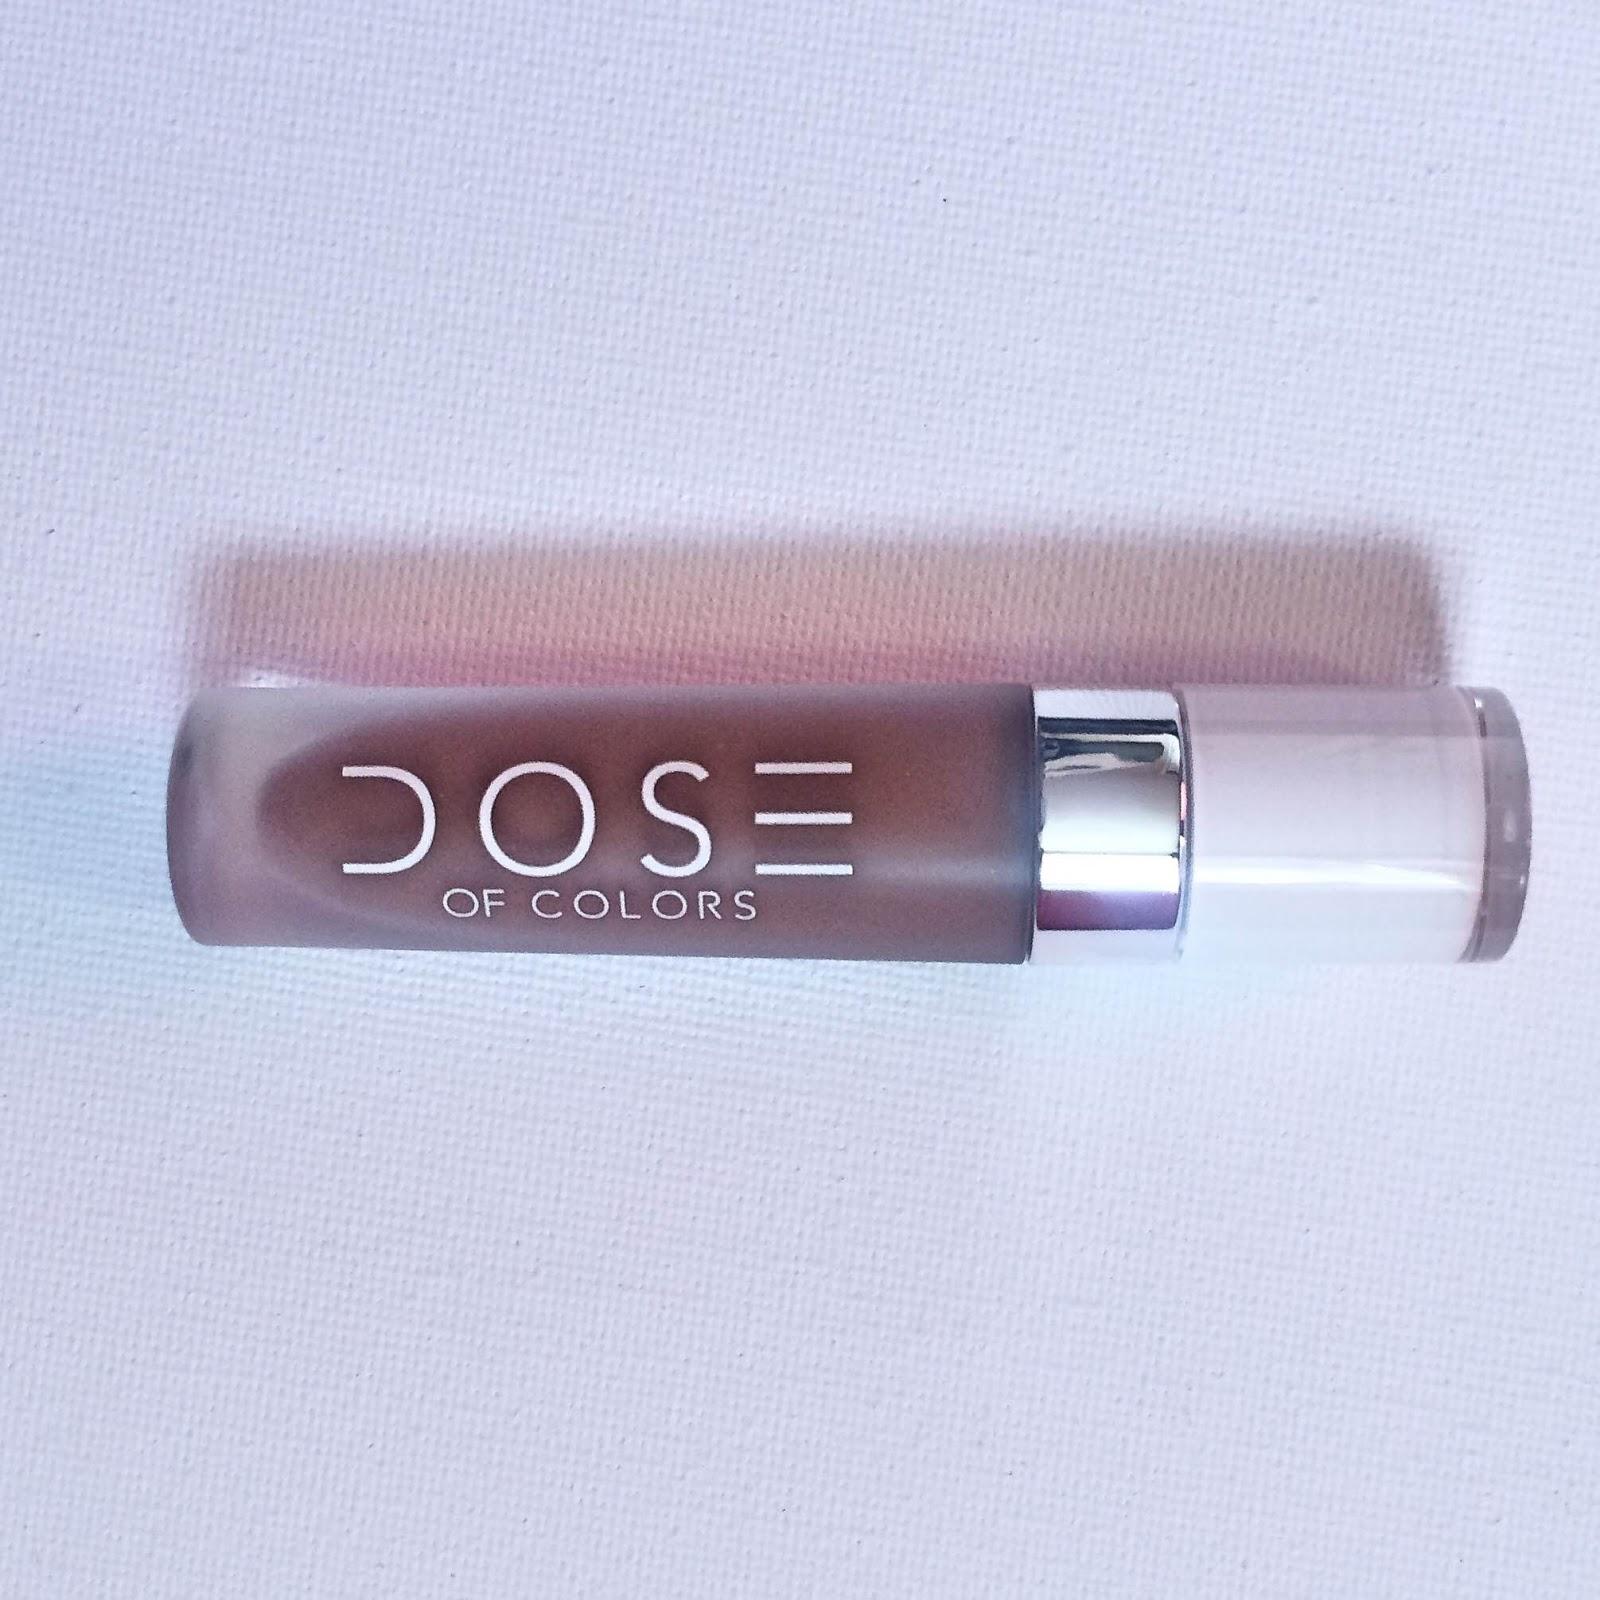 review dose of colors matte liquid lipsticks cork. Black Bedroom Furniture Sets. Home Design Ideas